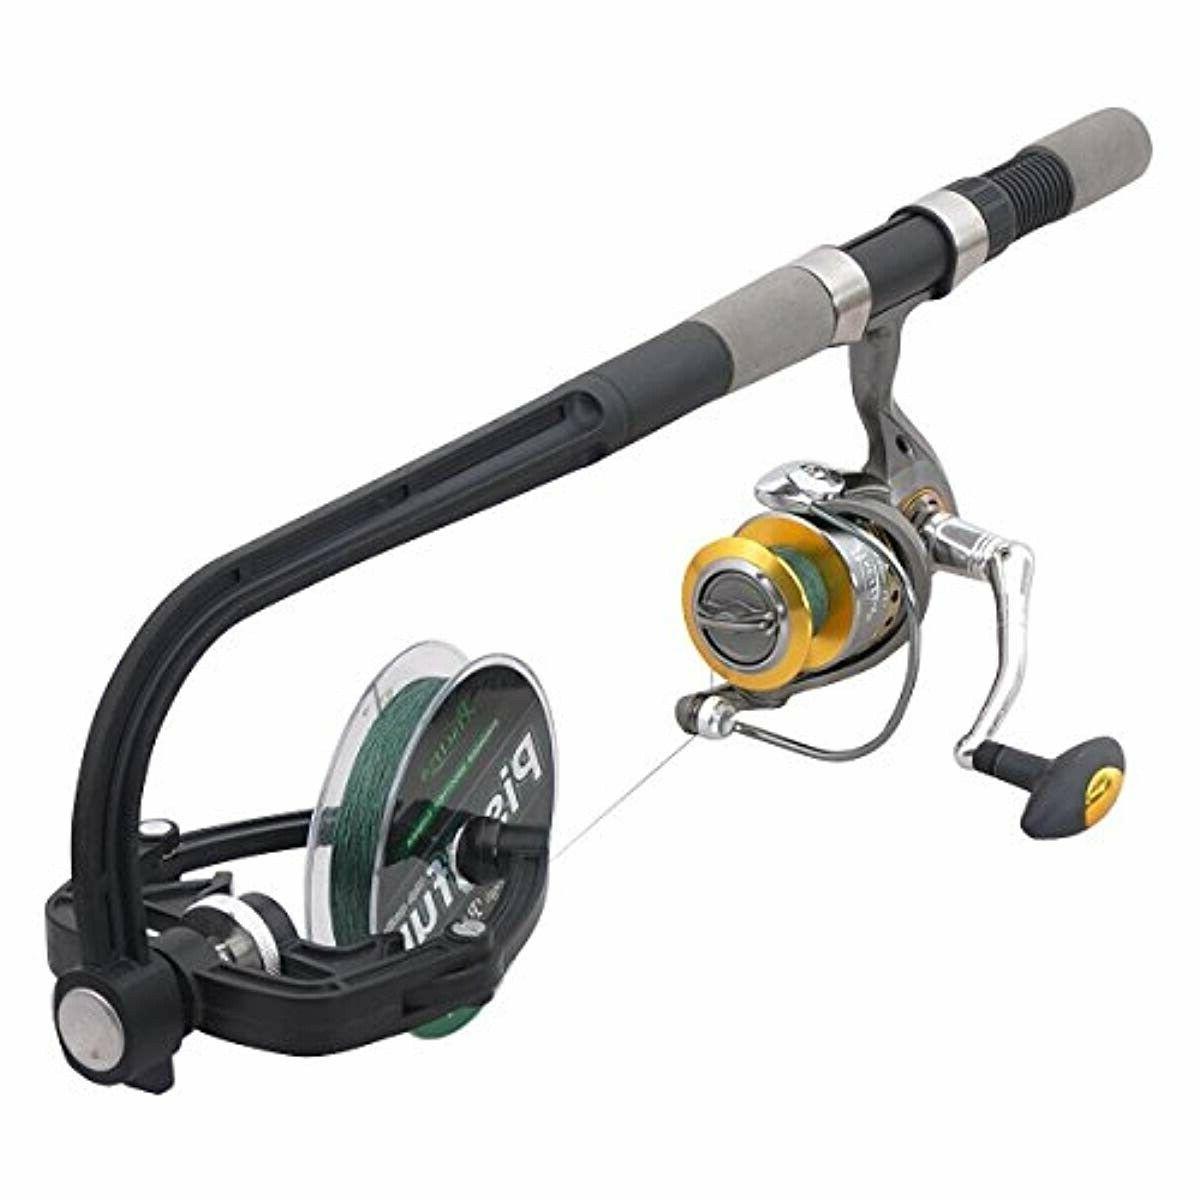 fishing line winder spooler machine spinning reel